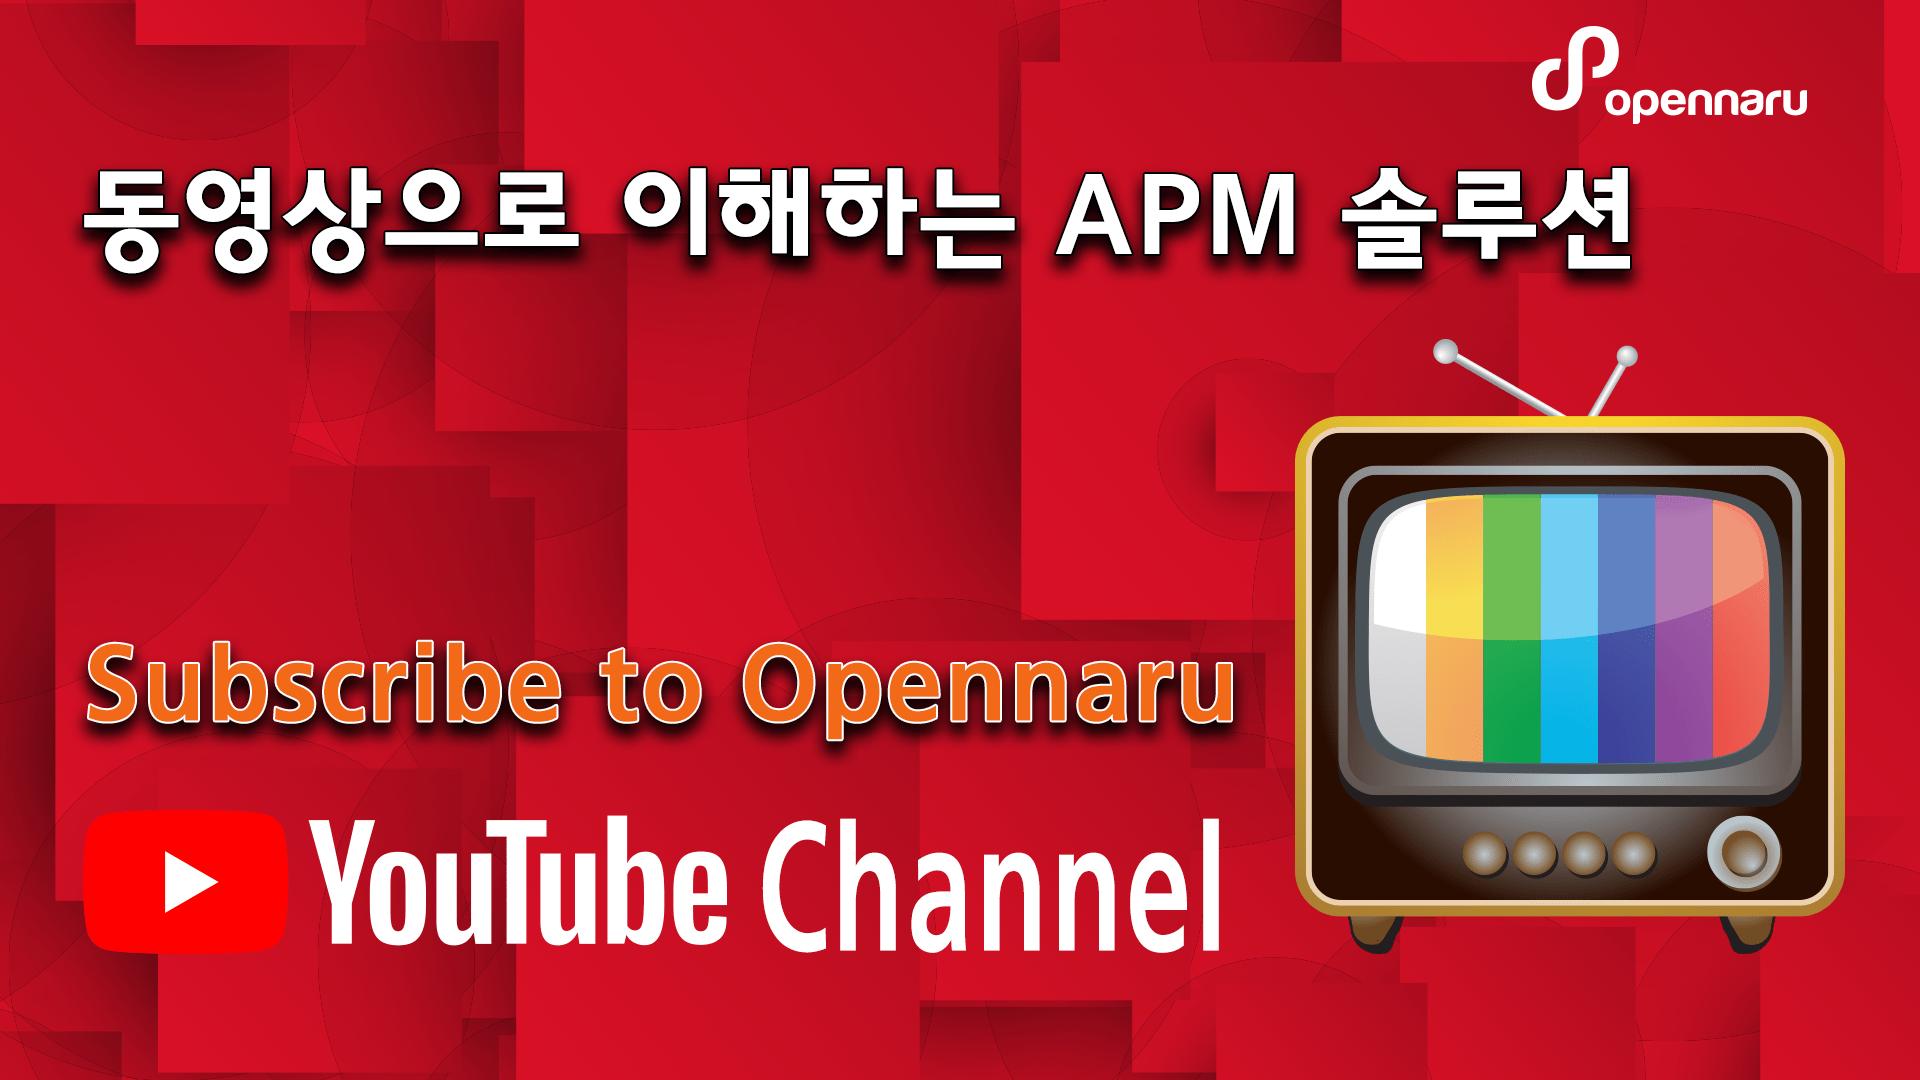 APM 솔루션 소개